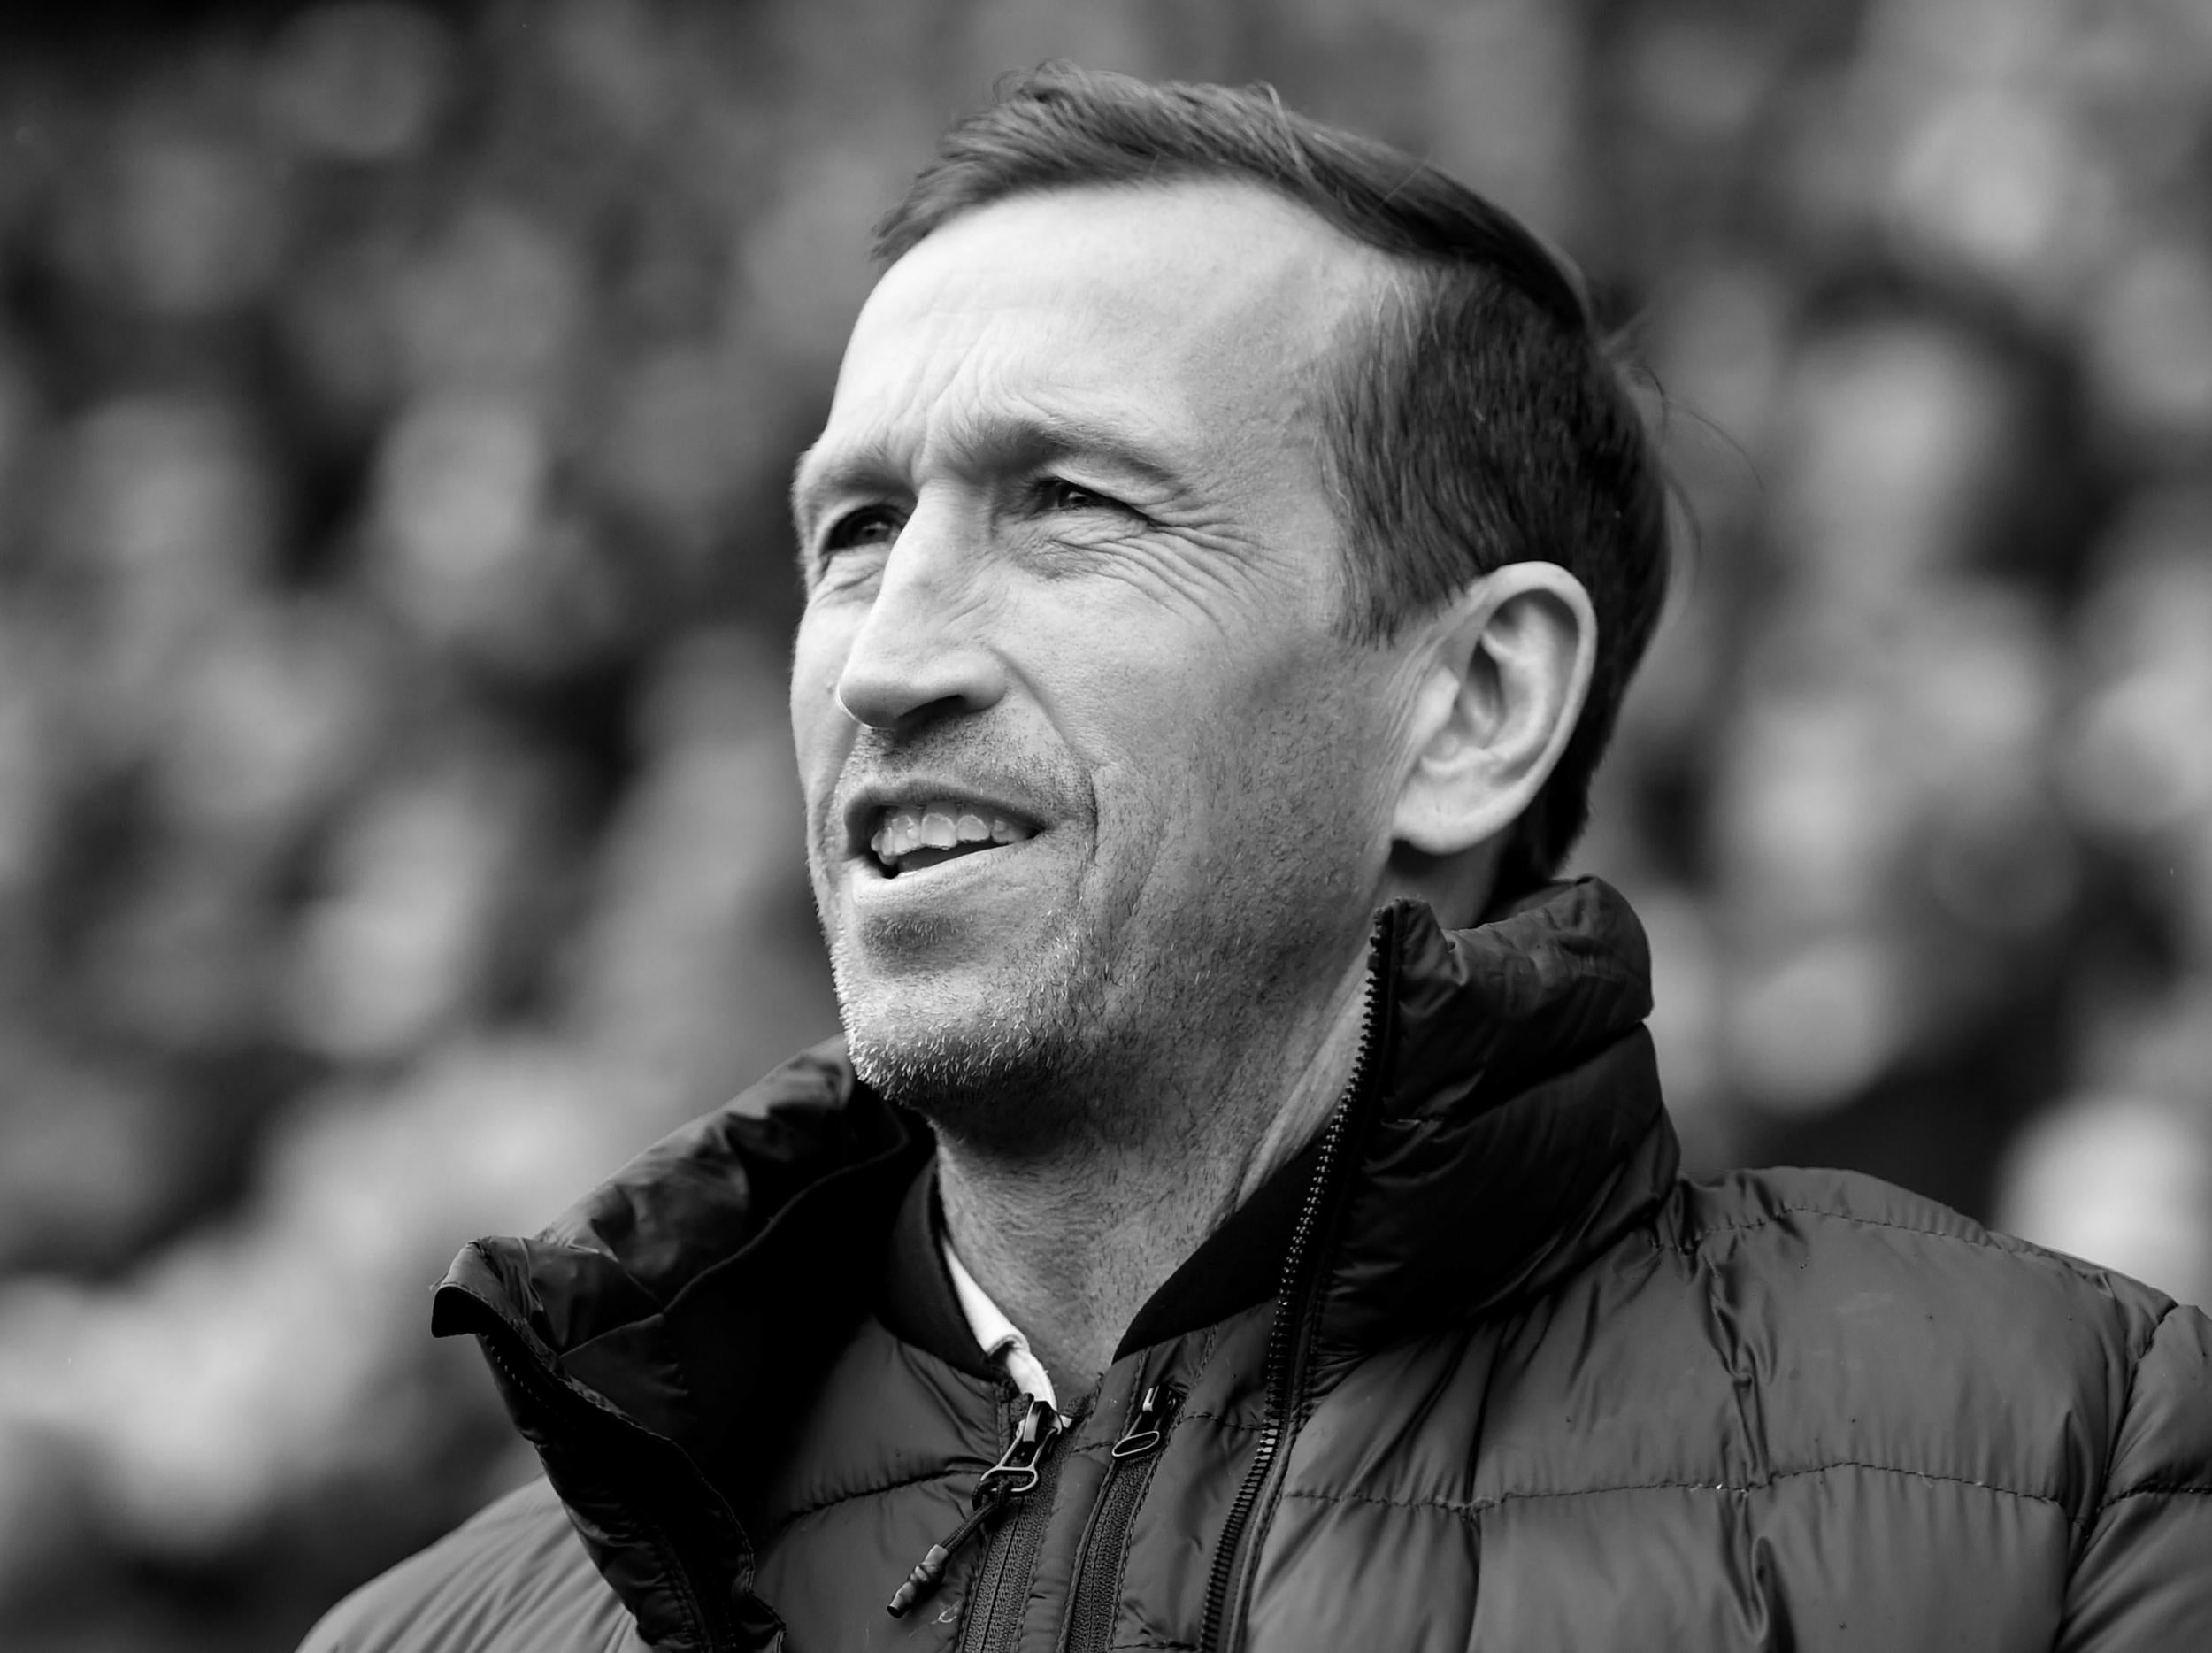 Justin Edinburgh dead: Leyton Orient manager and former Tottenham Hotspur defender dies aged 49